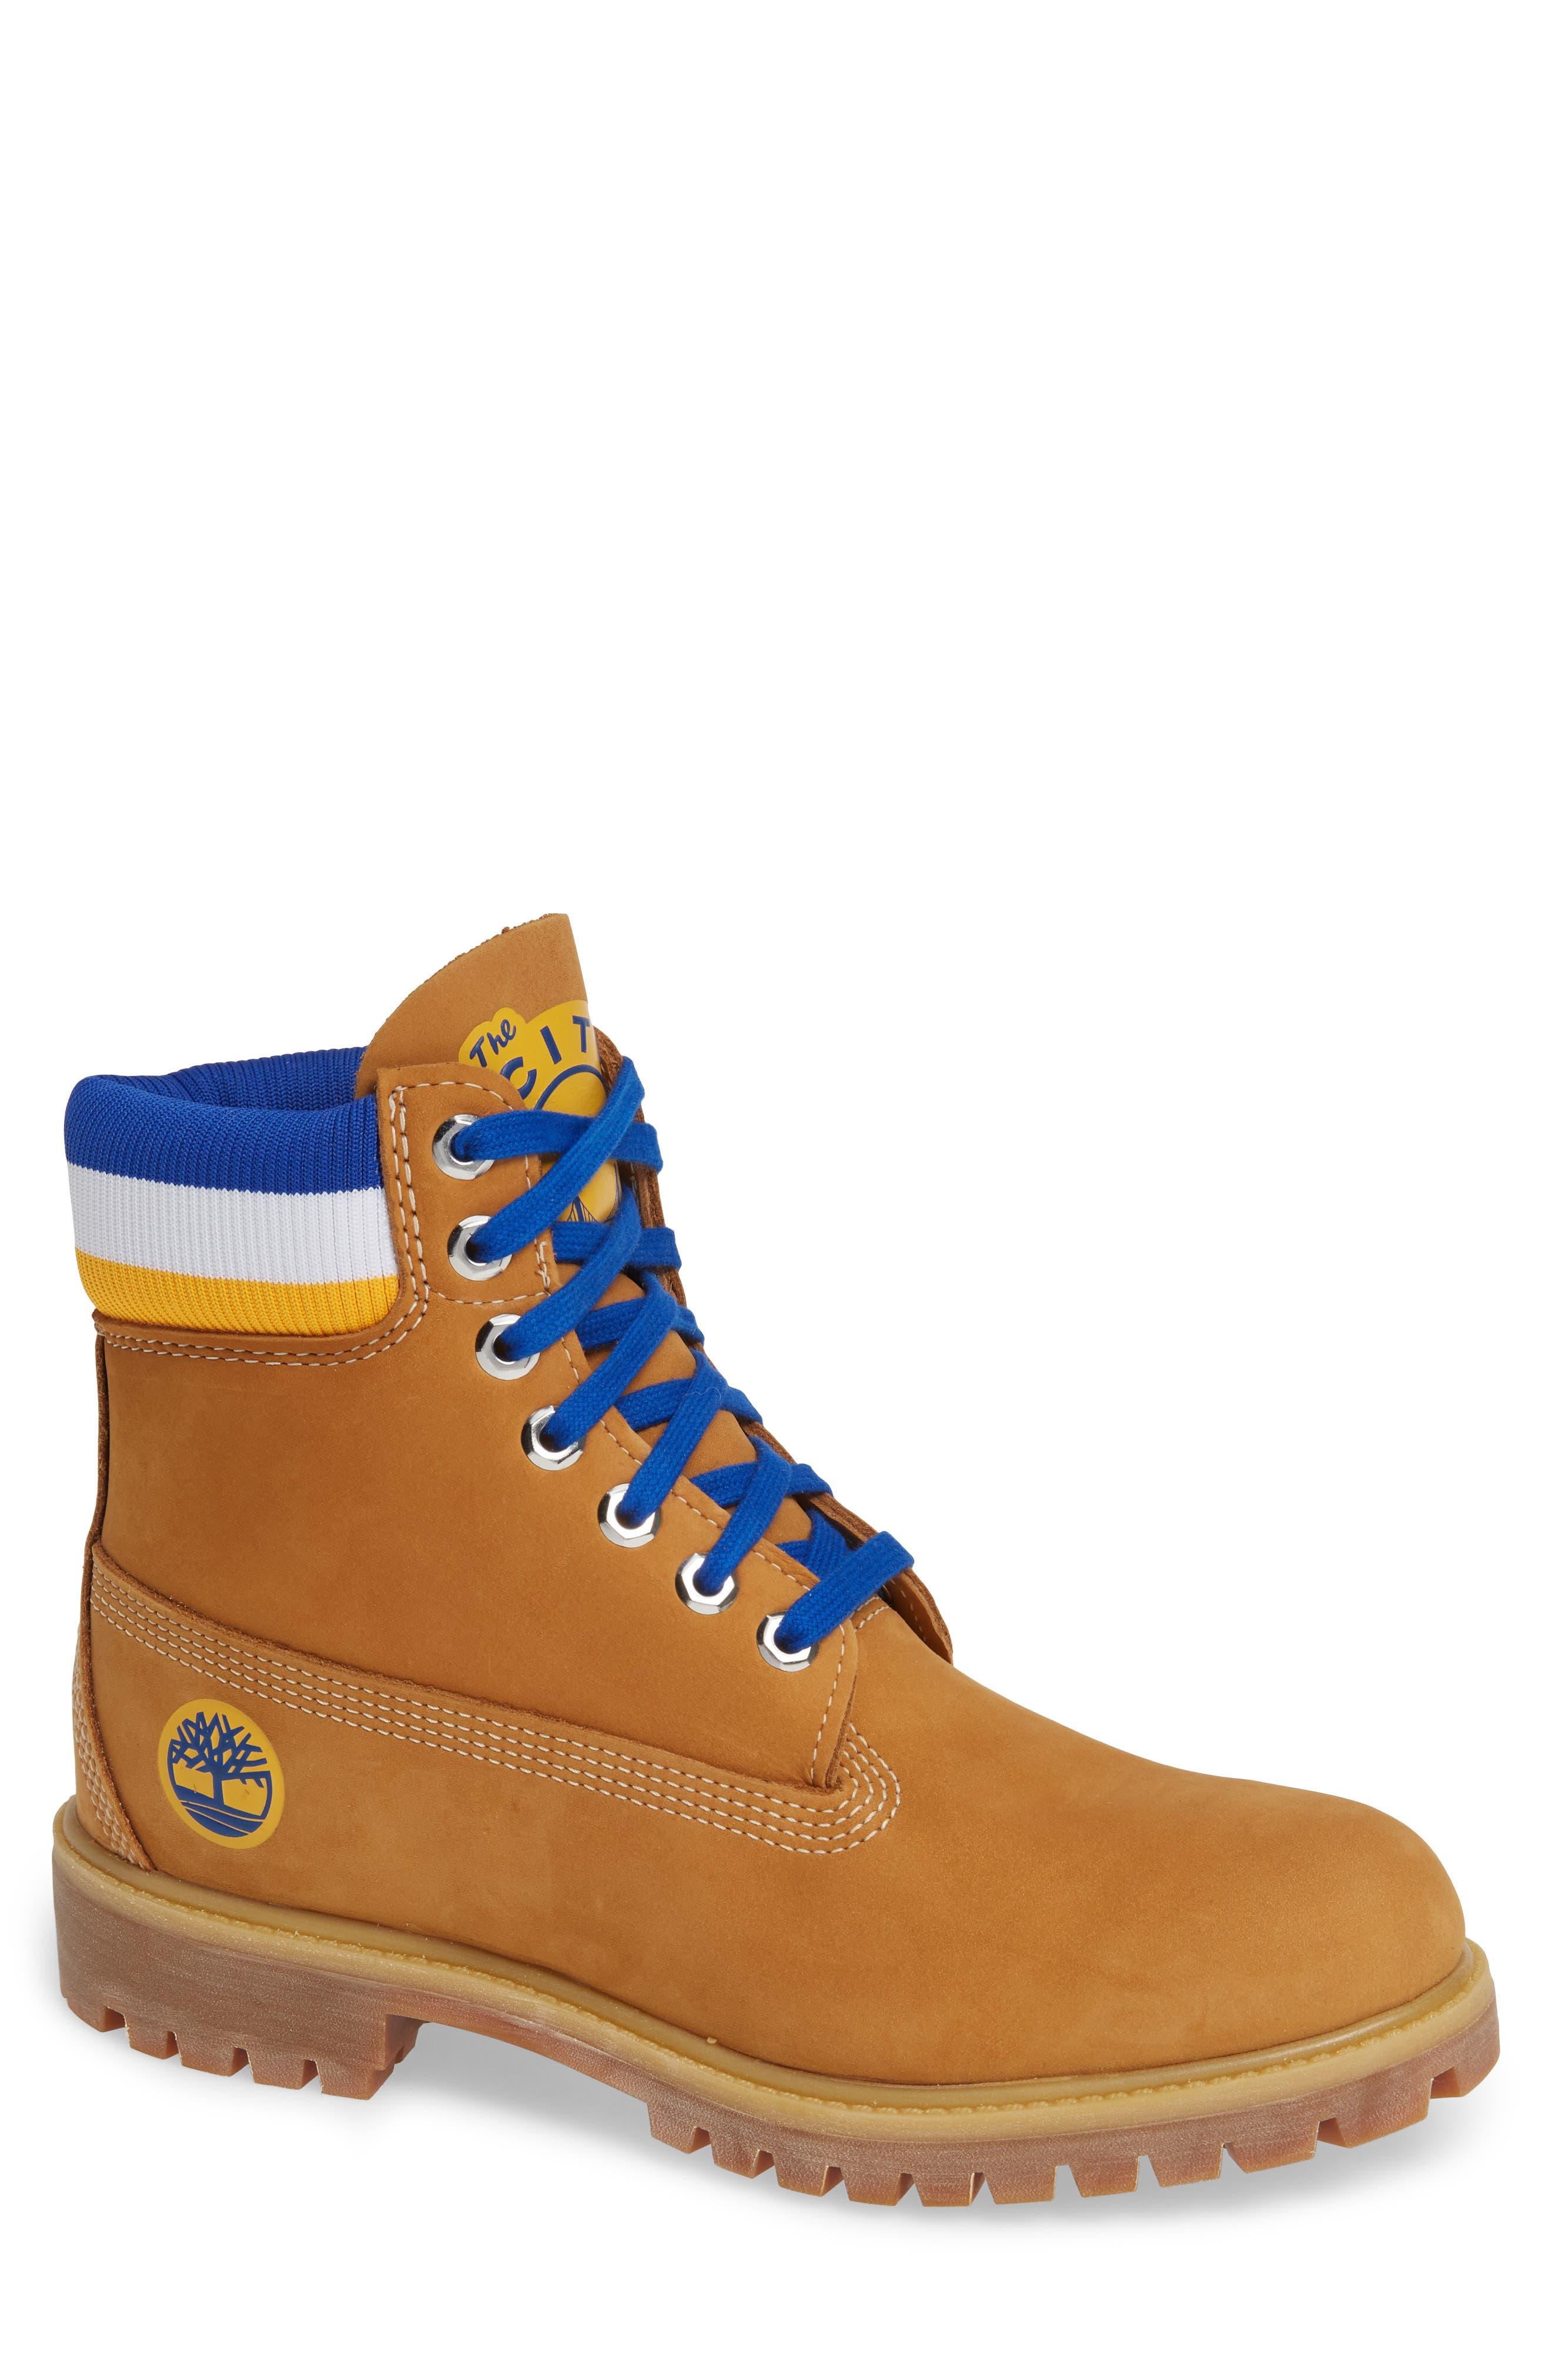 TIMBERLAND, Premium NBA Collection Boot, Main thumbnail 1, color, WHEAT NUBUCK/ GOLDEN STATE